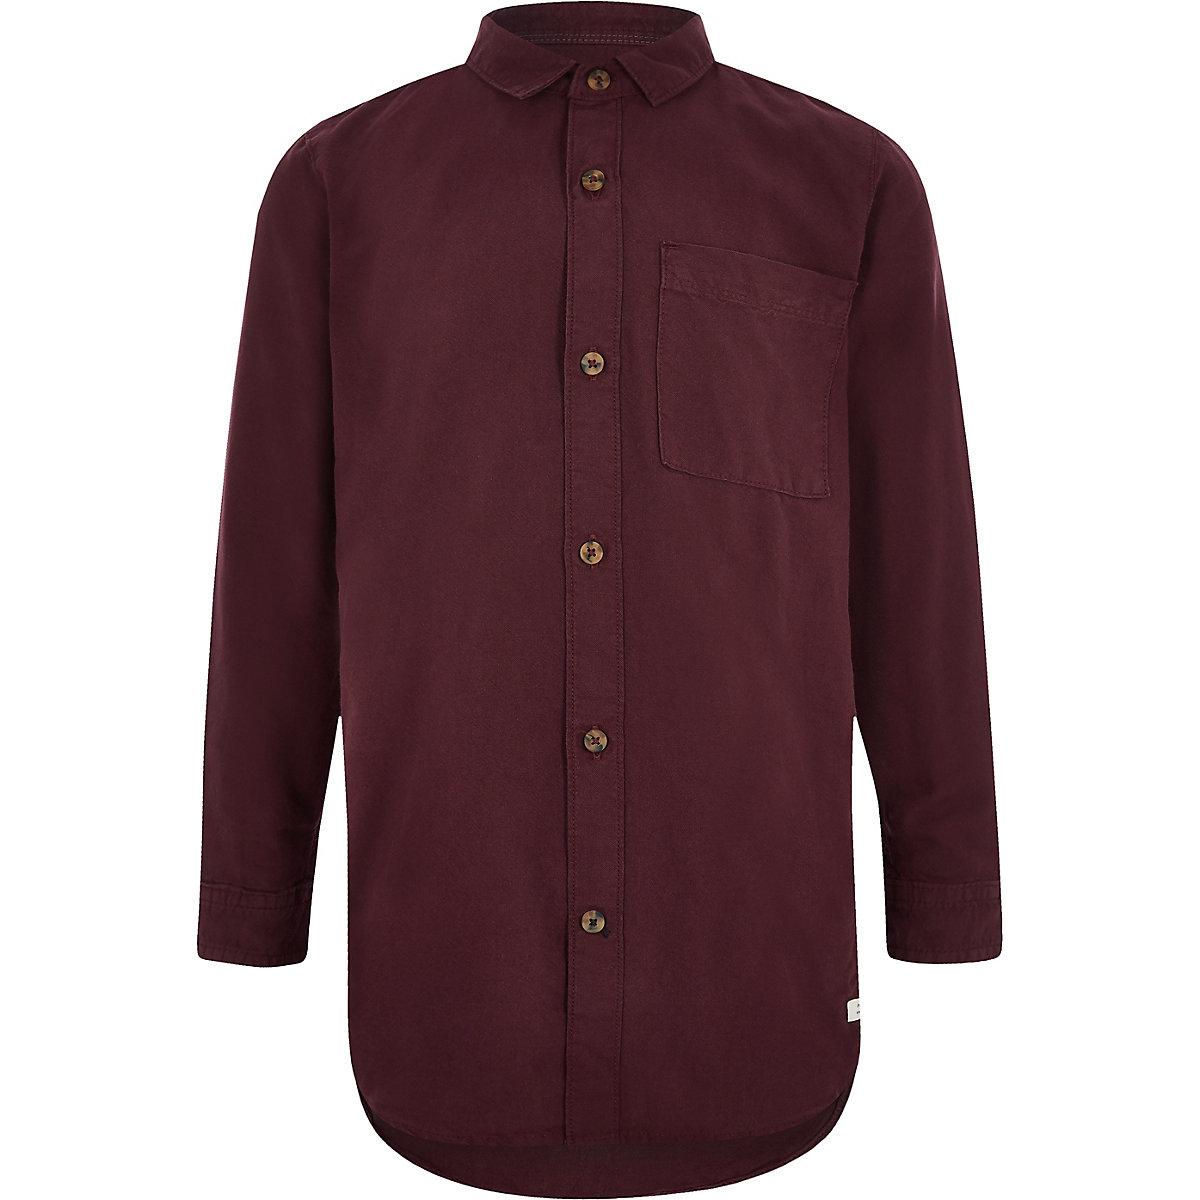 Boys dark red Oxford shirt